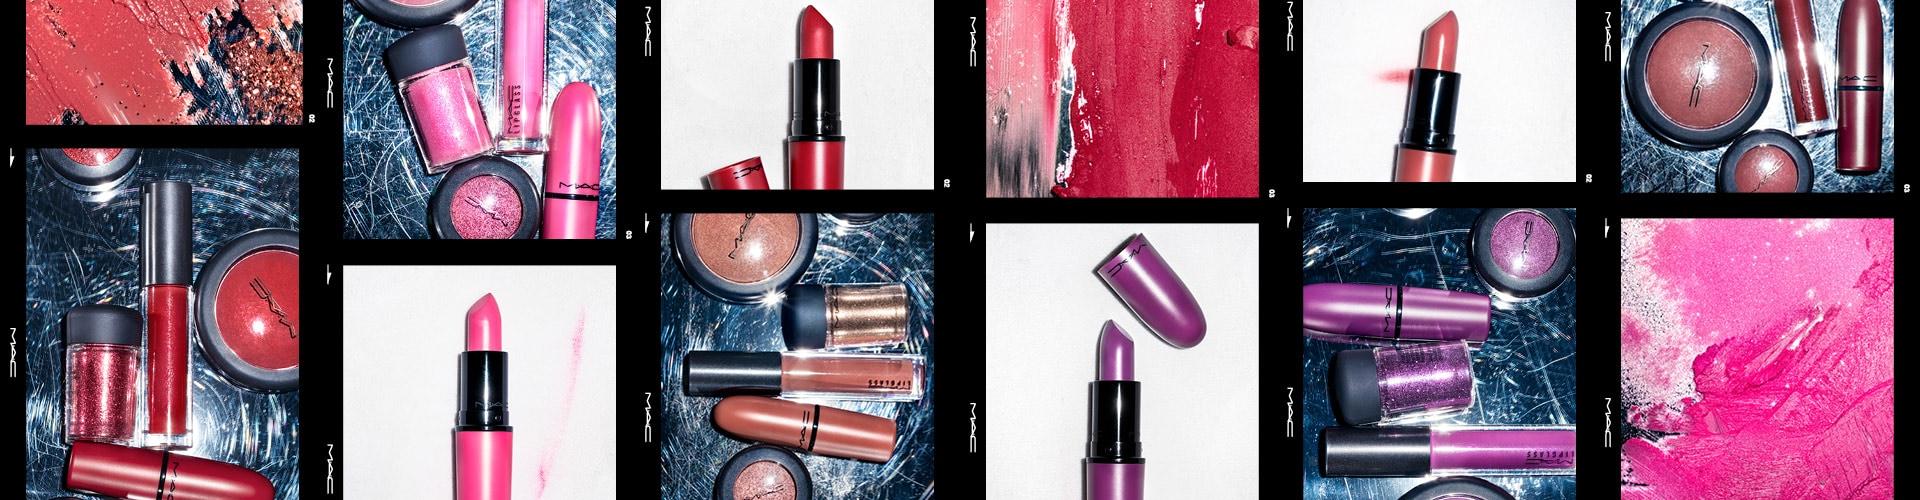 2019 year lifestyle- Makeup mac beautiful art collection